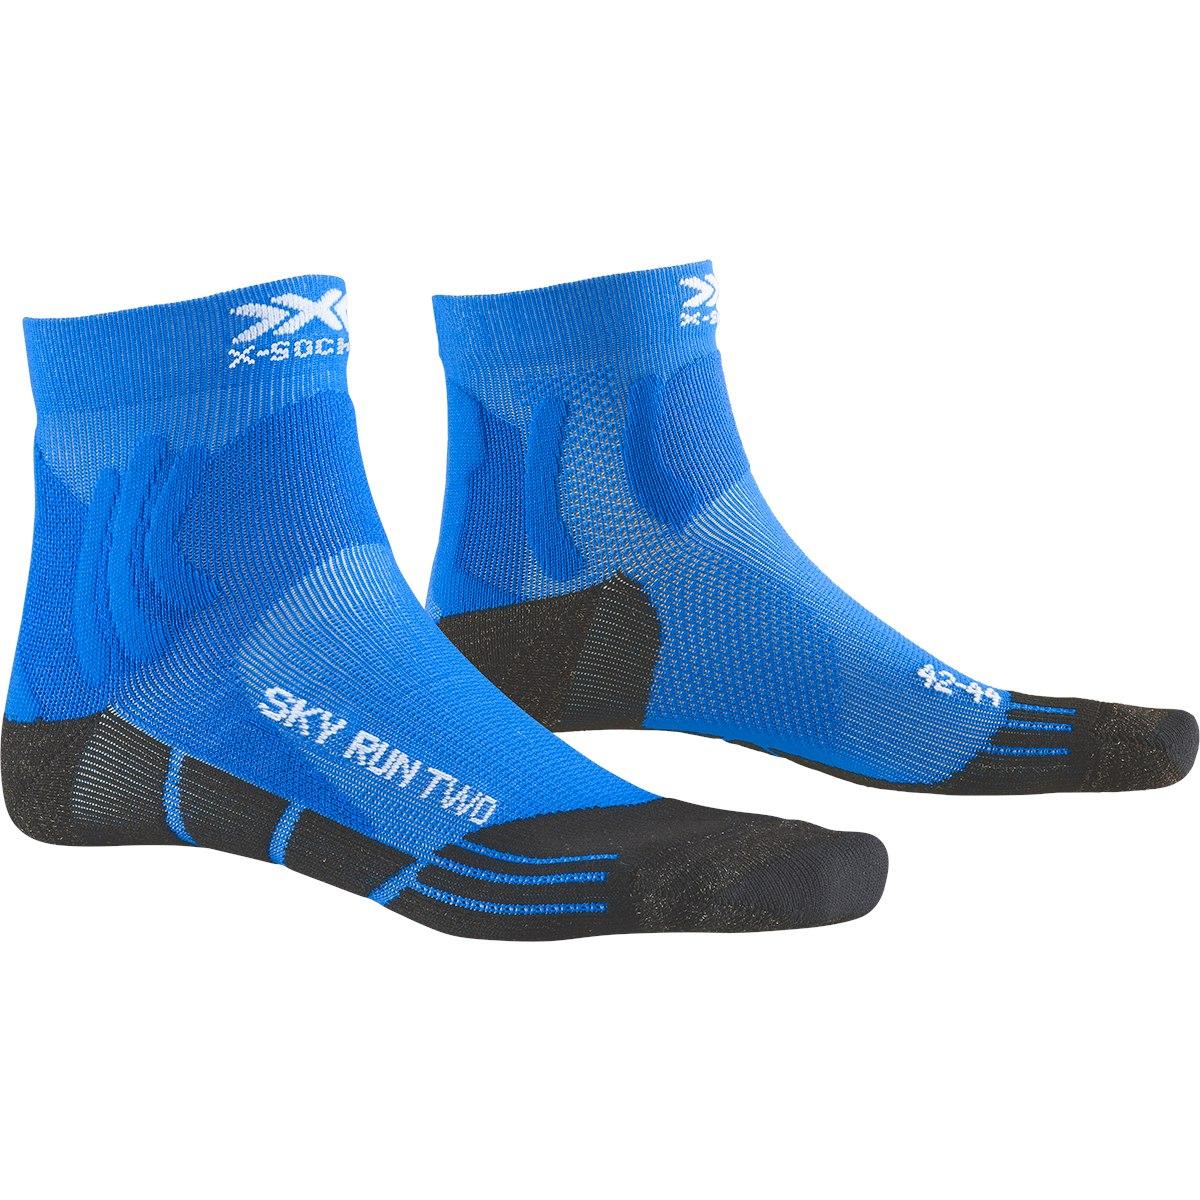 X-Socks Sky Run Two Laufsocken - twyce blue/anthracite